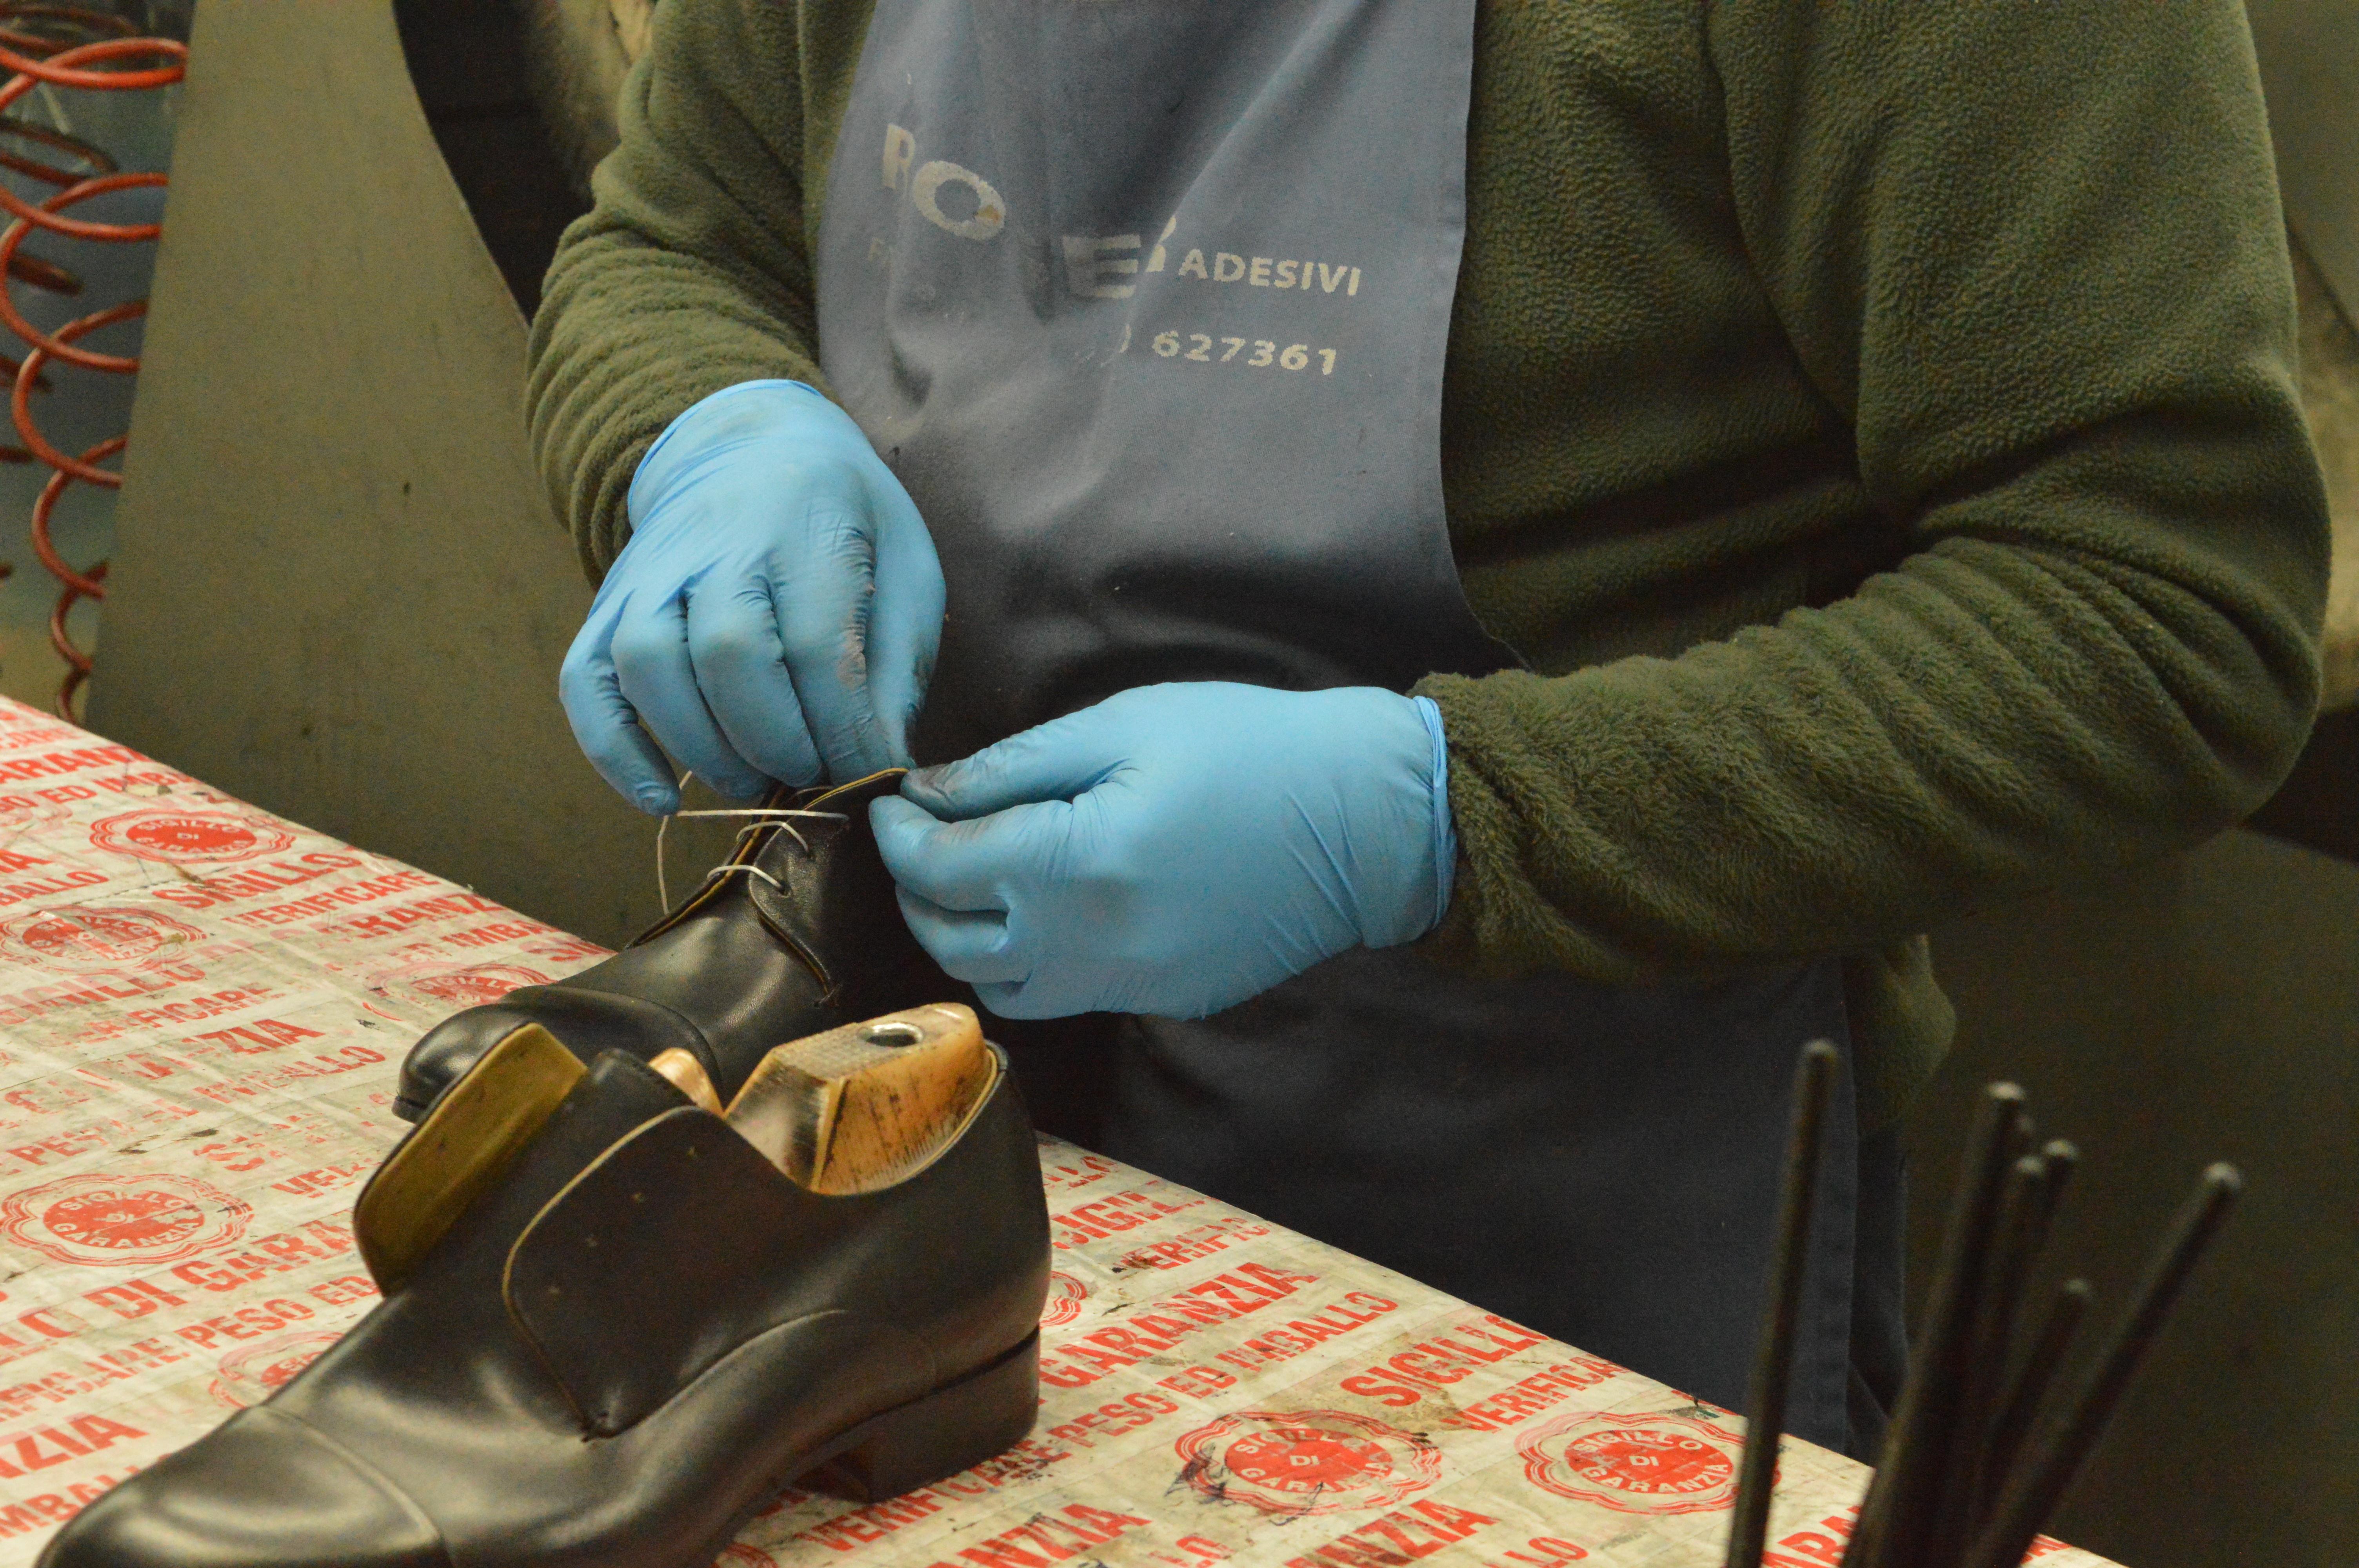 Italian Artisan Makes Italian Leather Shoe by hand | MakersValley Blog